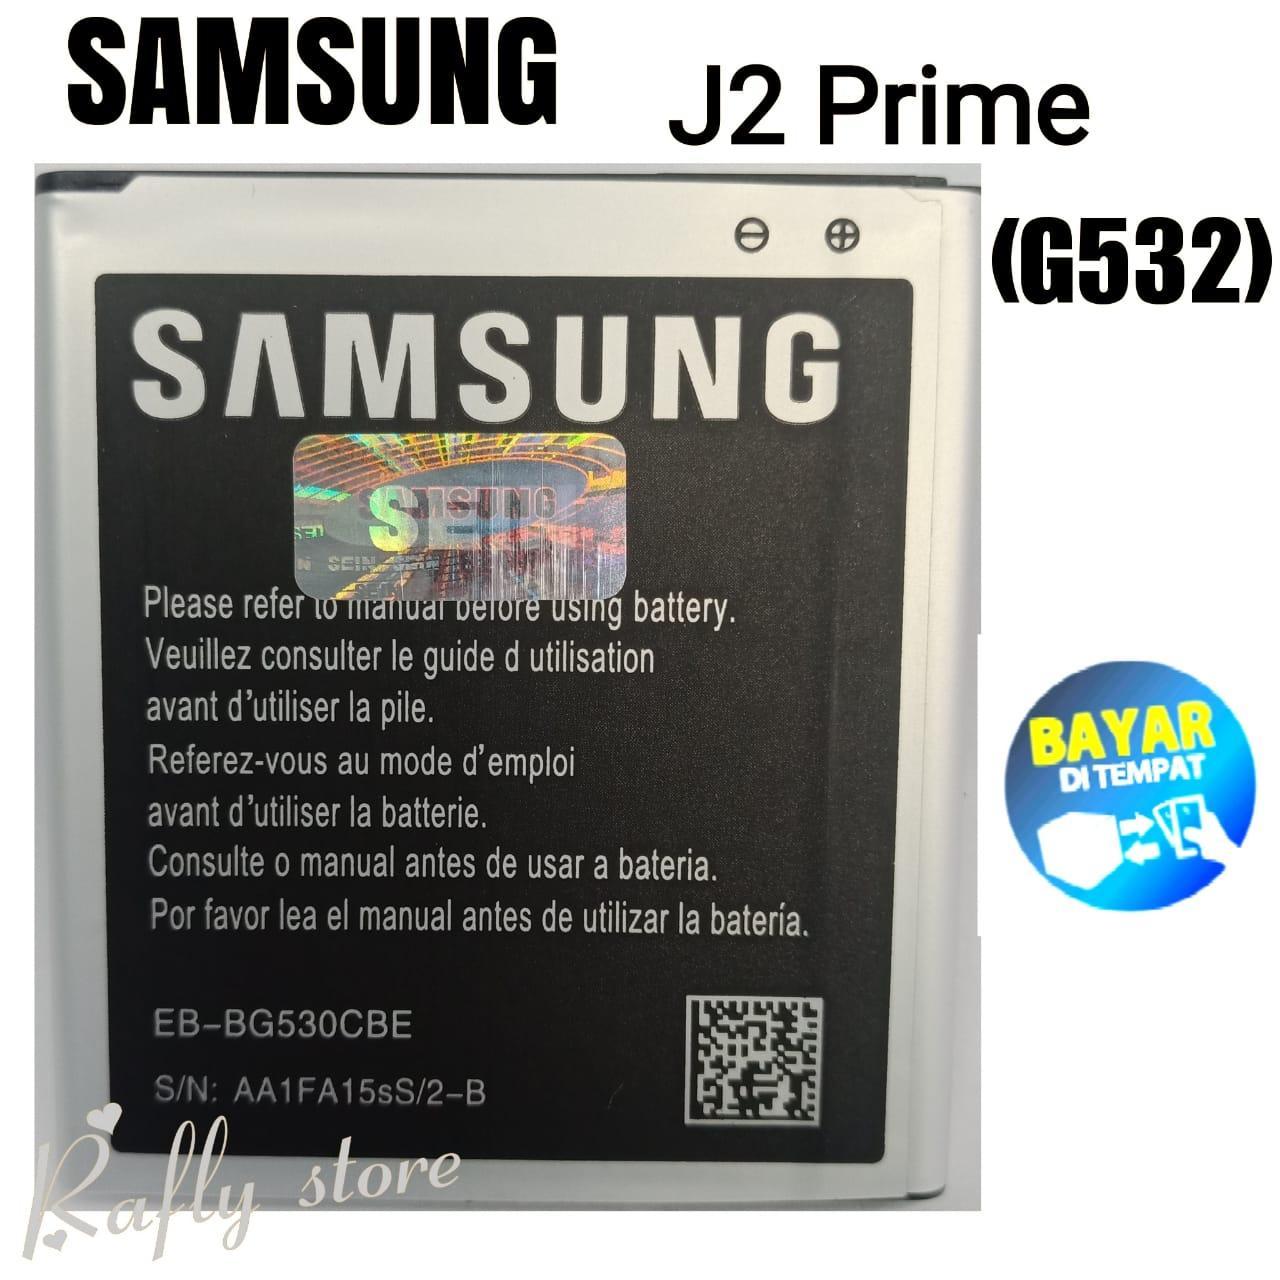 Rafly; Batrai Samsung J2 Prime (G532) Baterai Handphone Batre Android Battery Batere Samsung